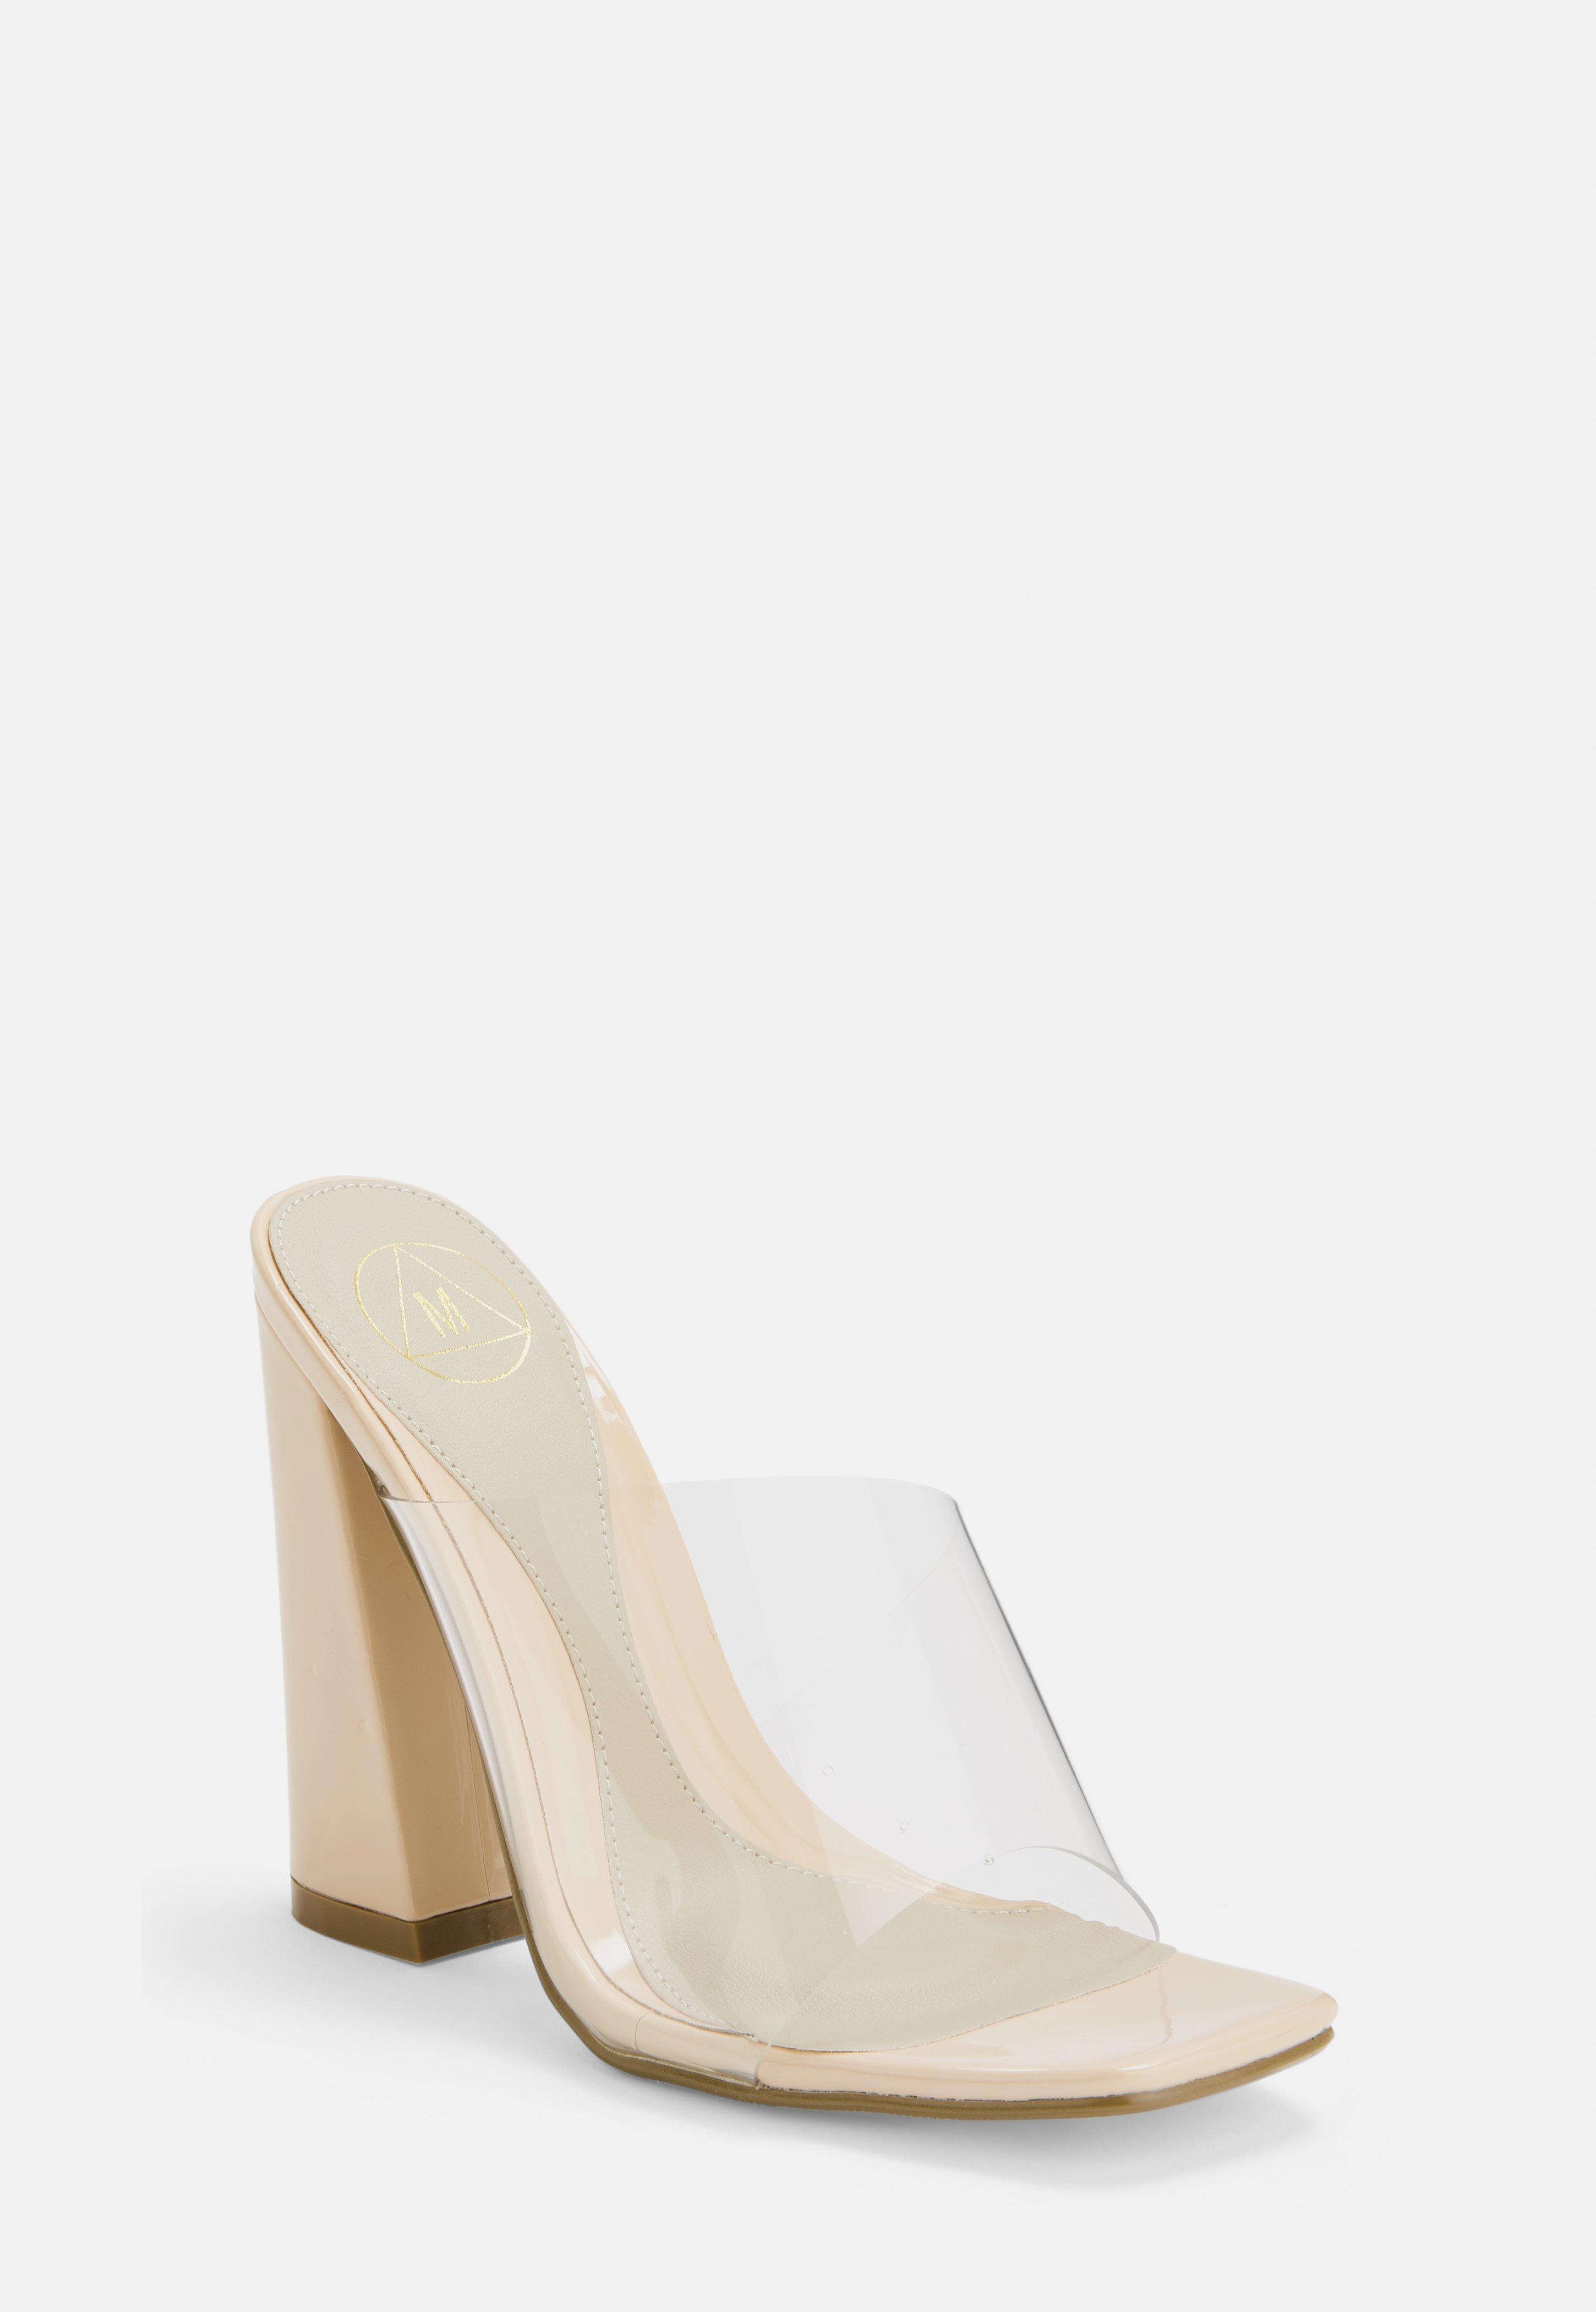 3e169025b1 Nude Asymmetric Clear Flared Heel Mules